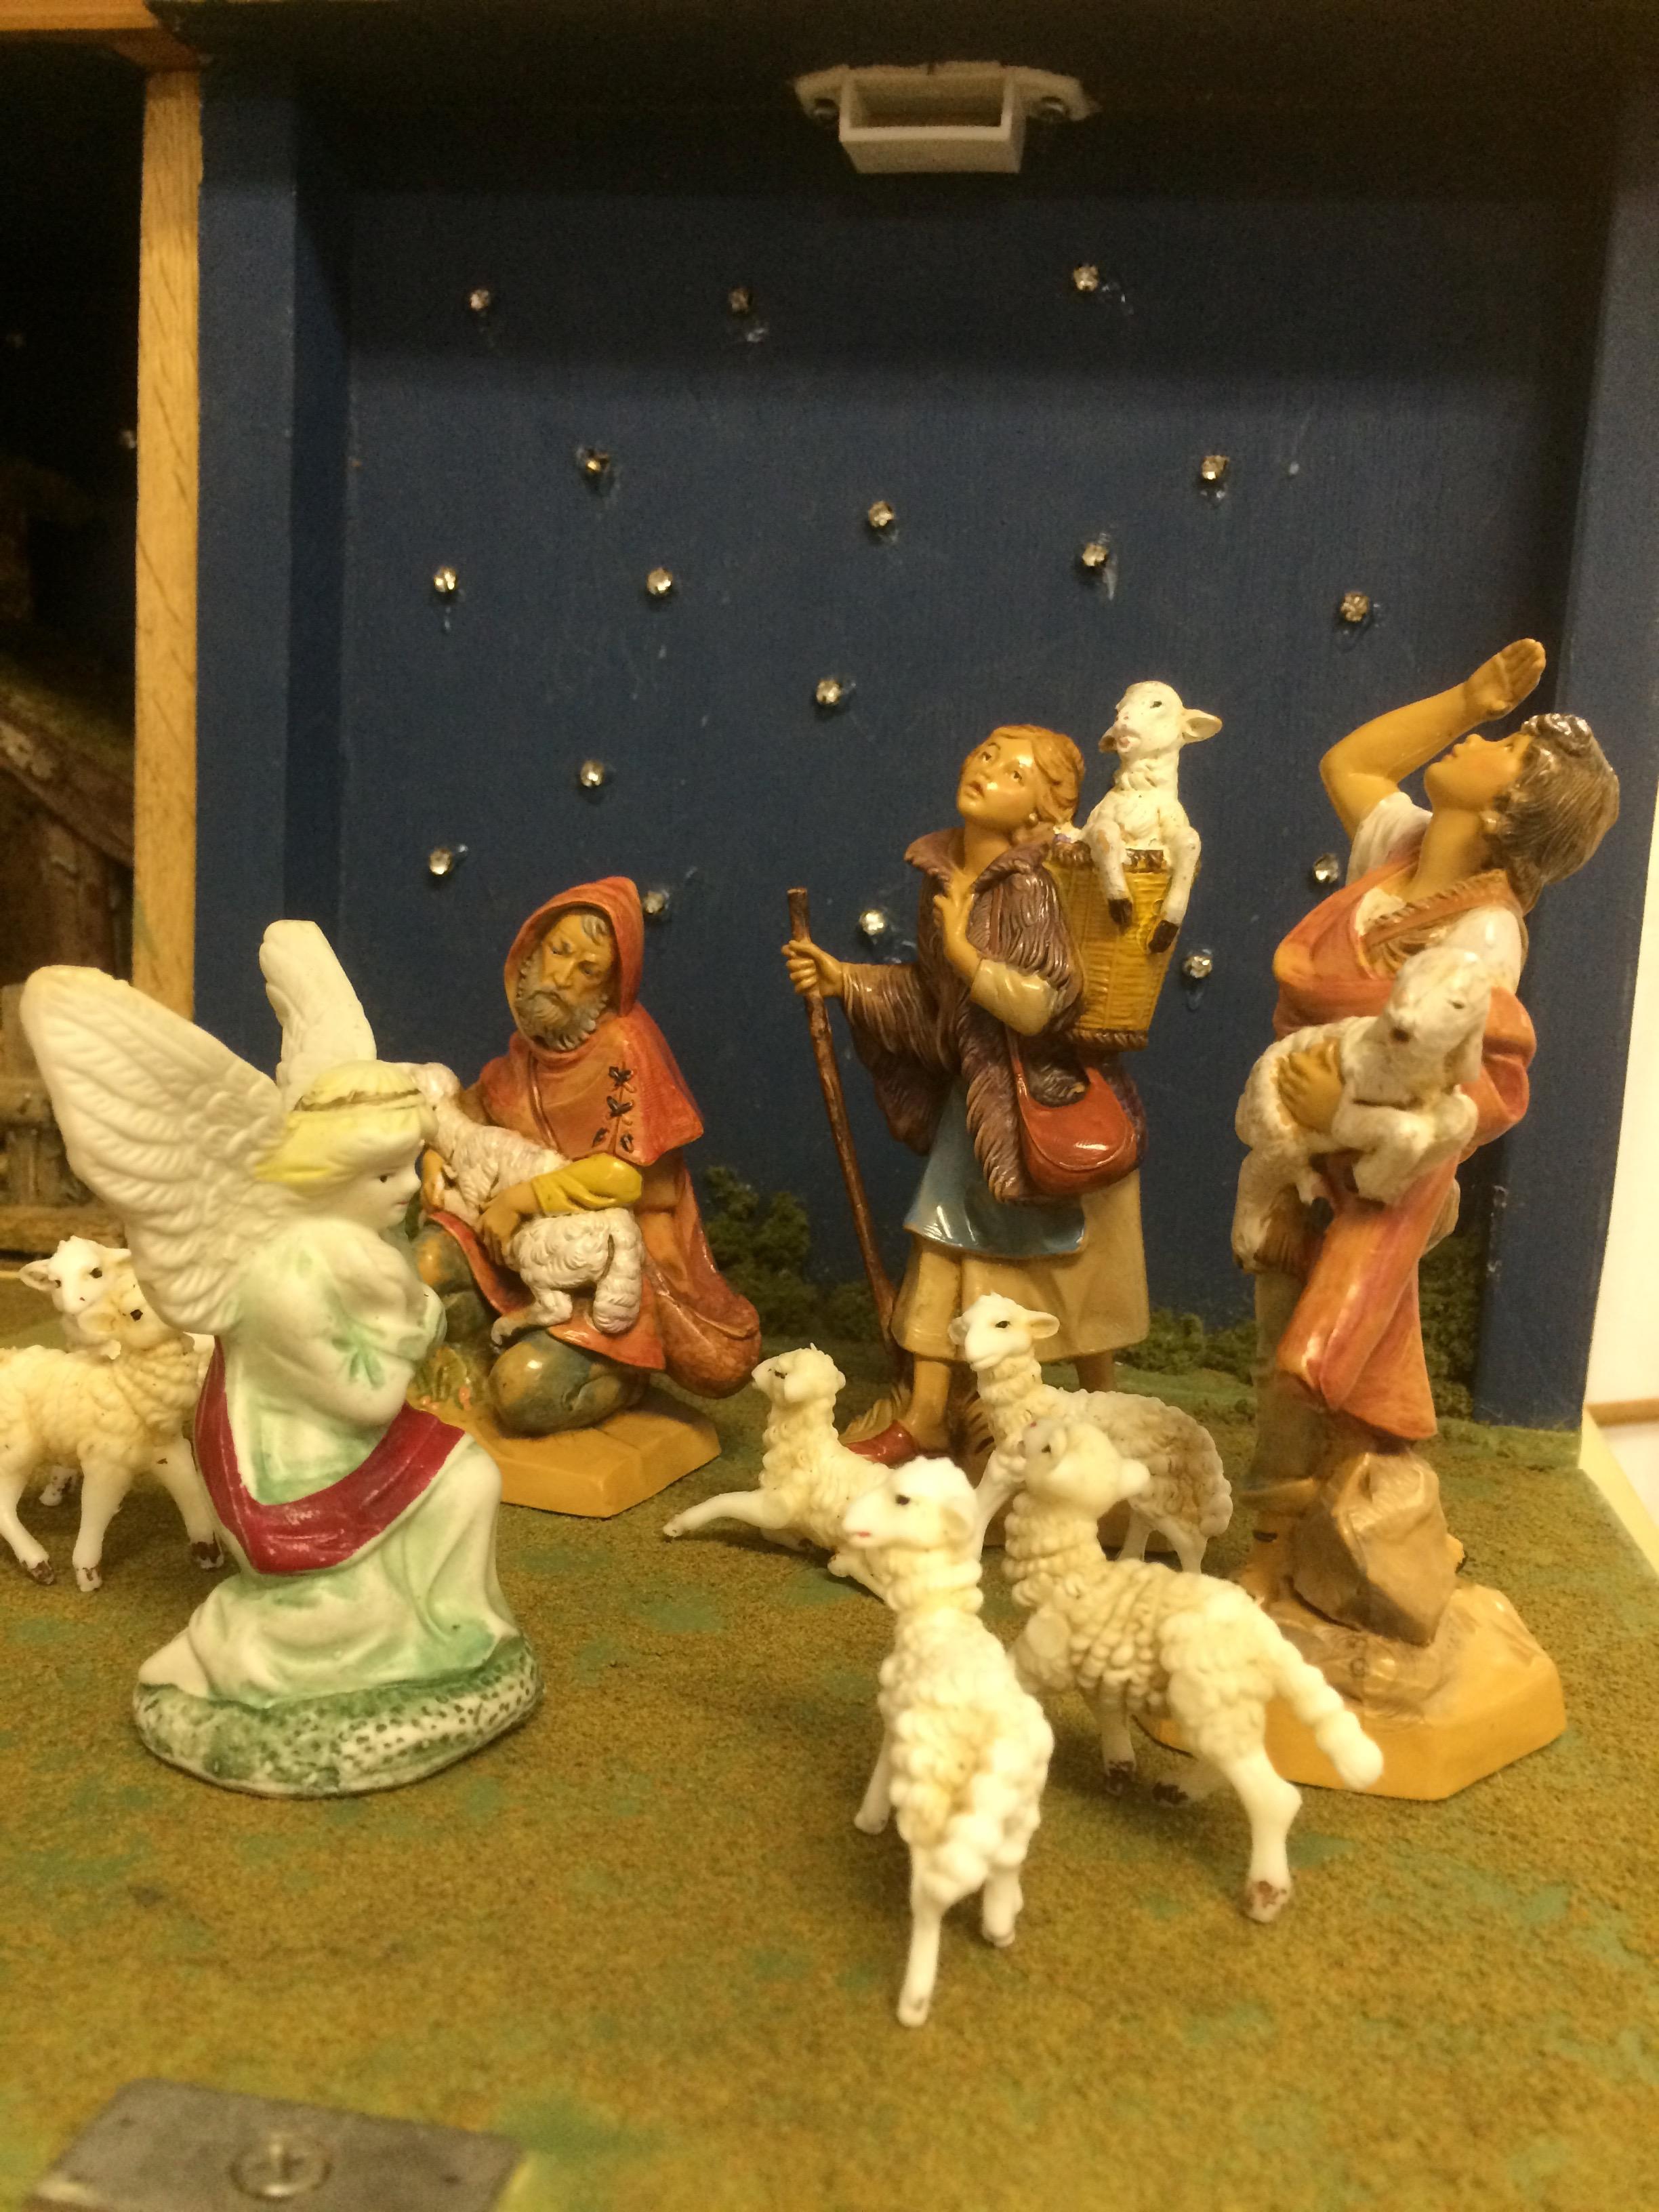 The Shepherds in the Field